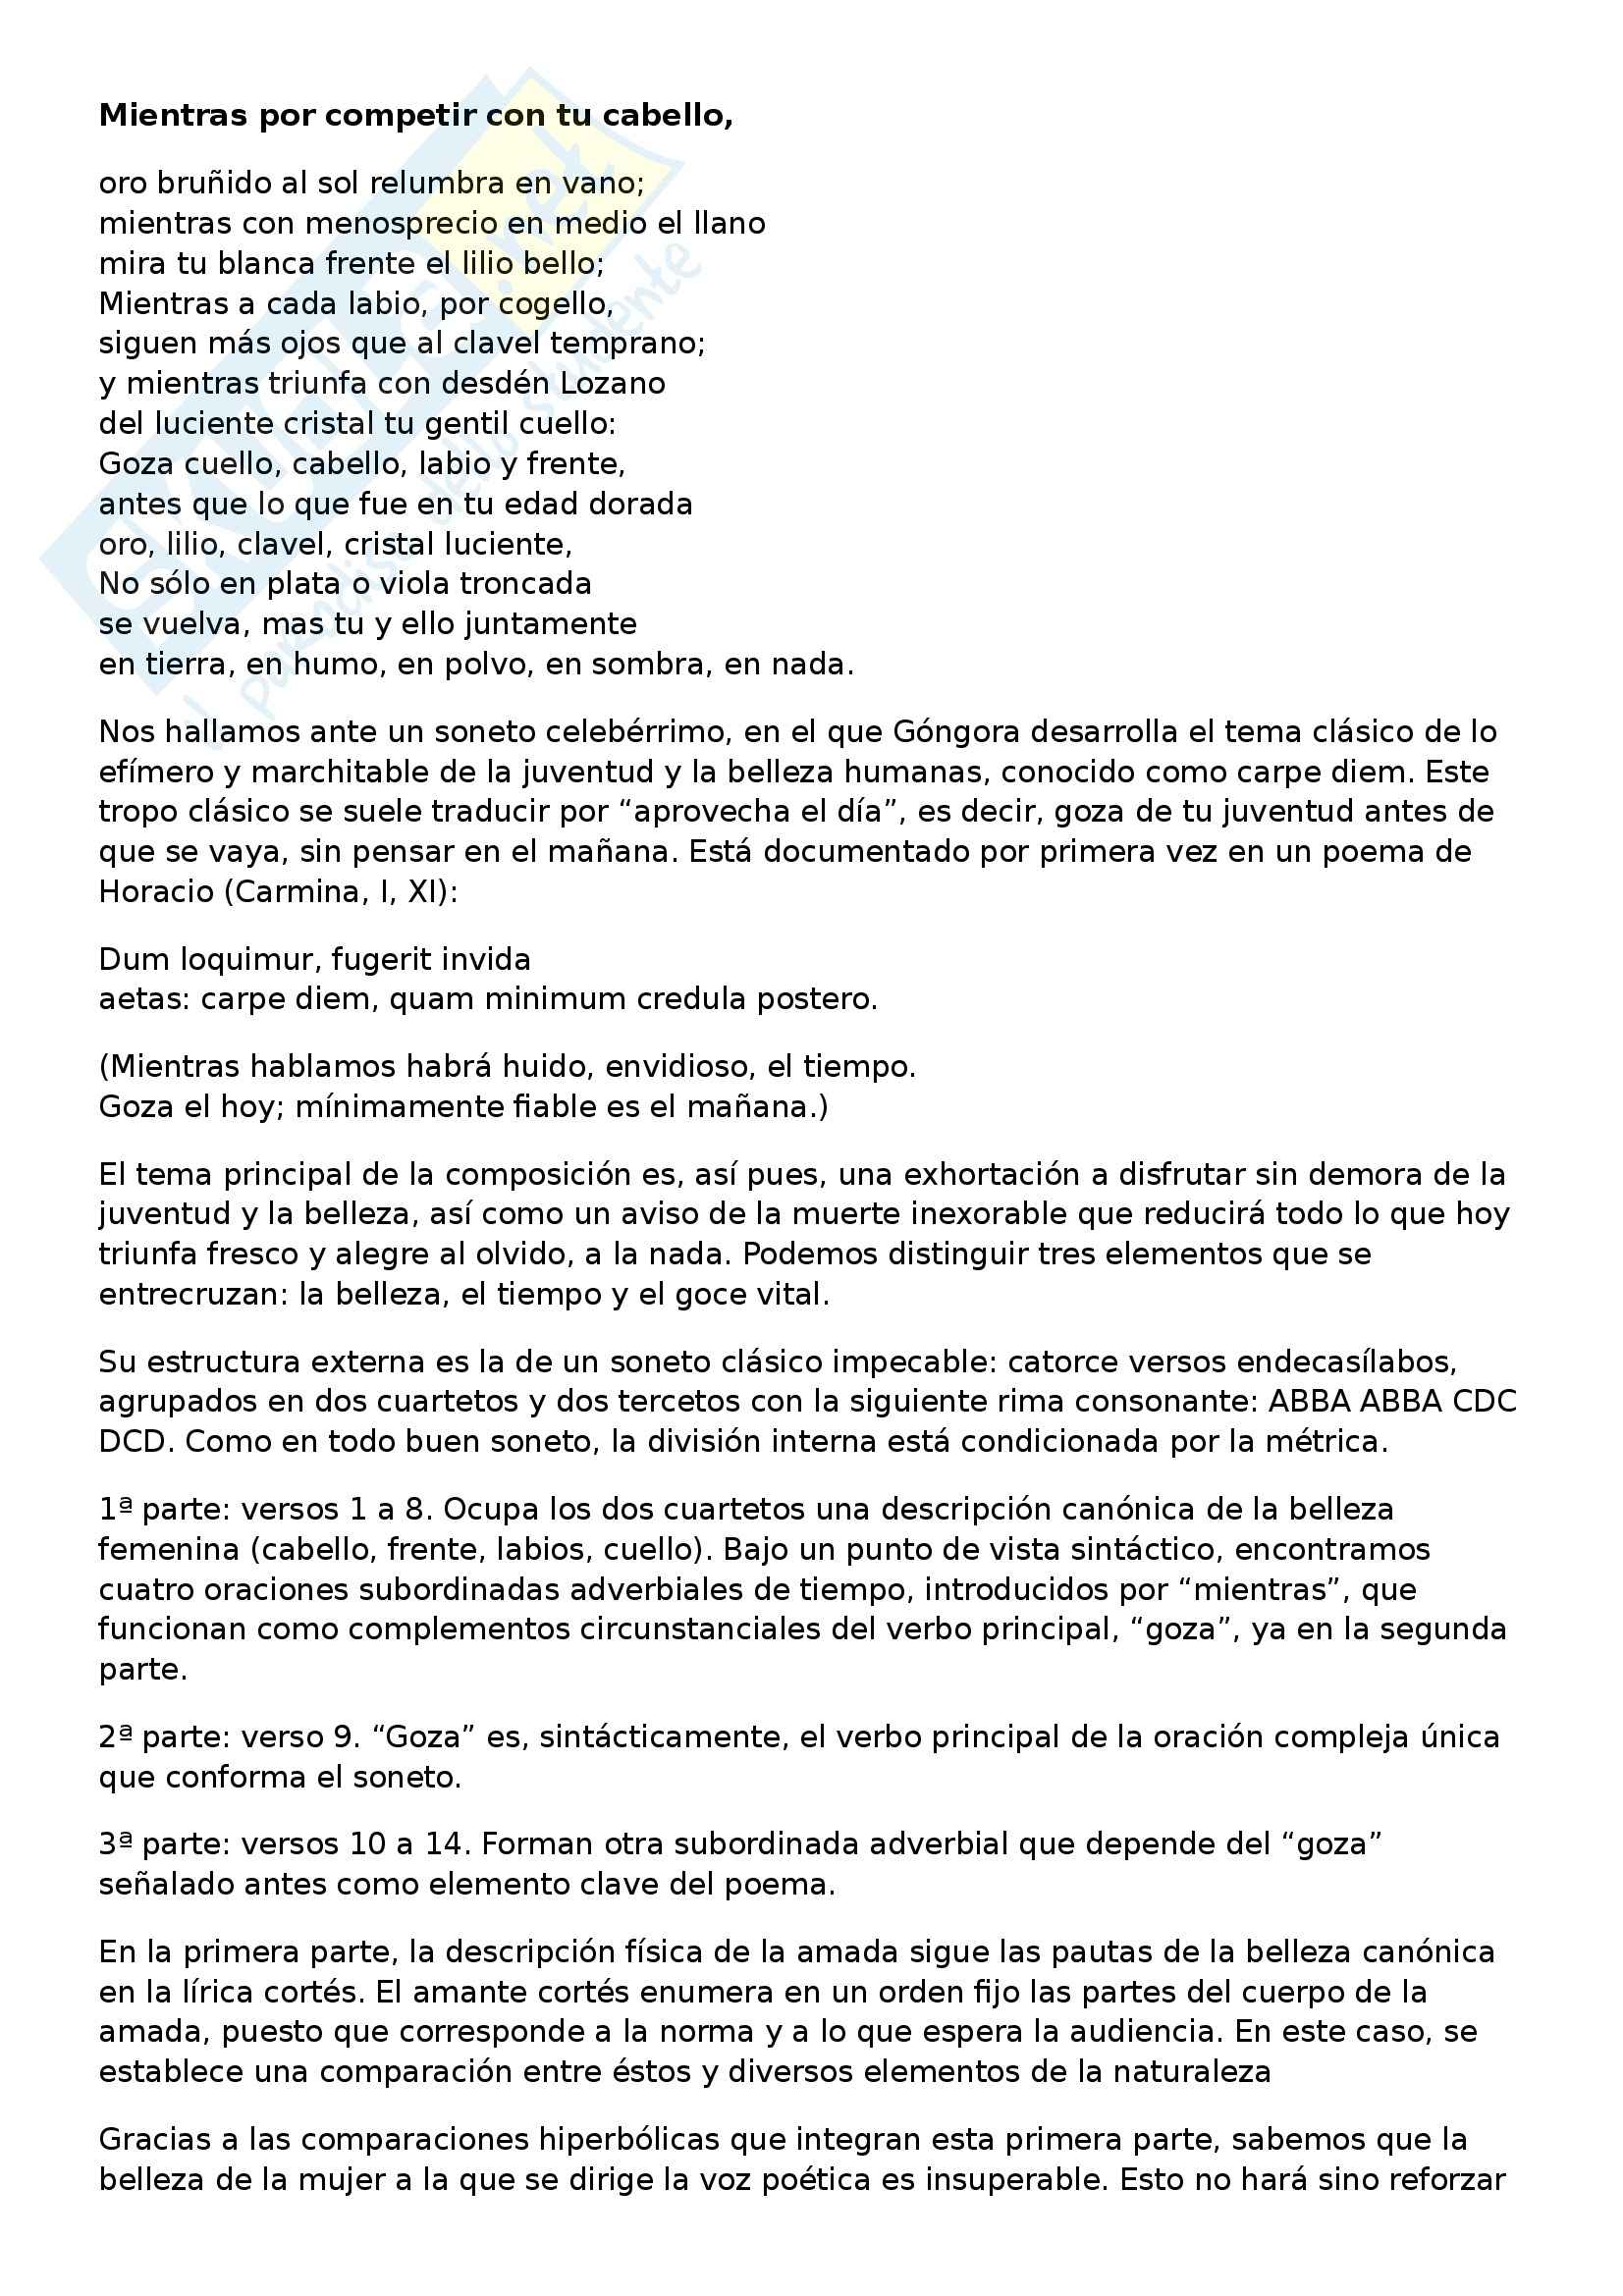 Letteratura spagnola - Quevedo vs Gongora Pag. 6